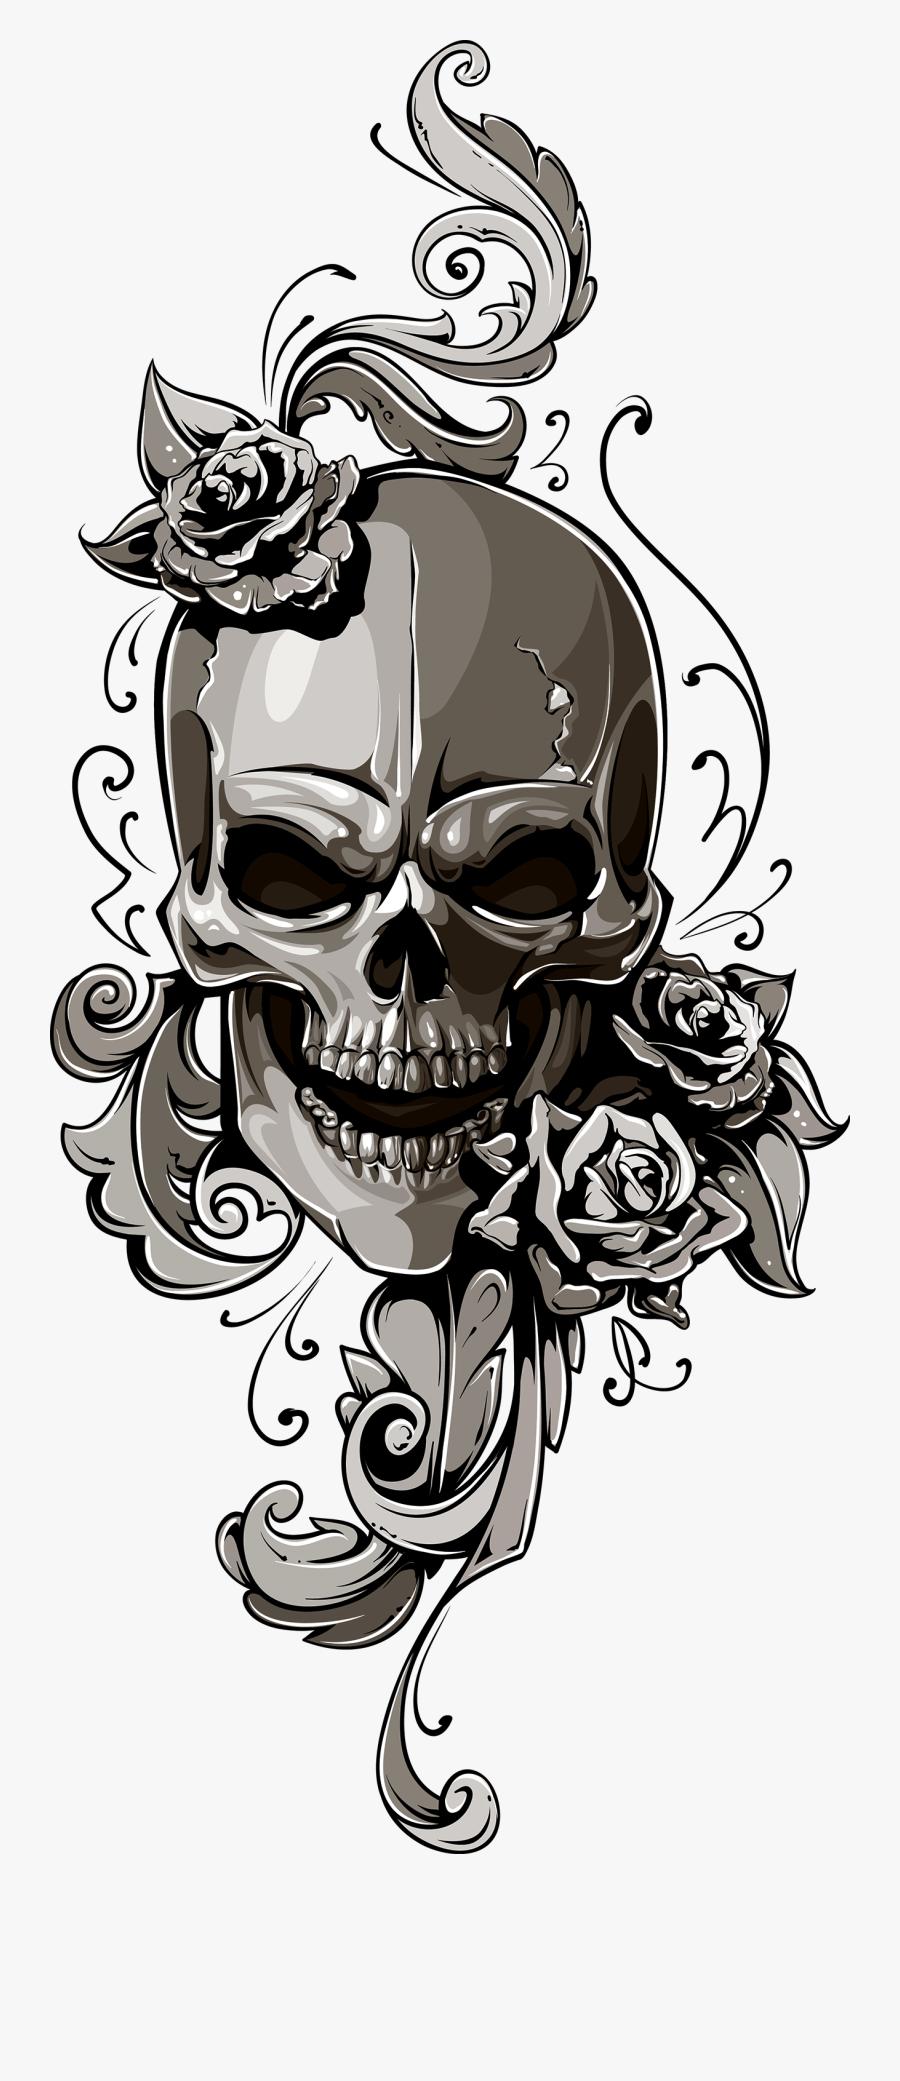 School Old Skull Human Symbolism Clipart - Tattoo Skull Old School, Transparent Clipart